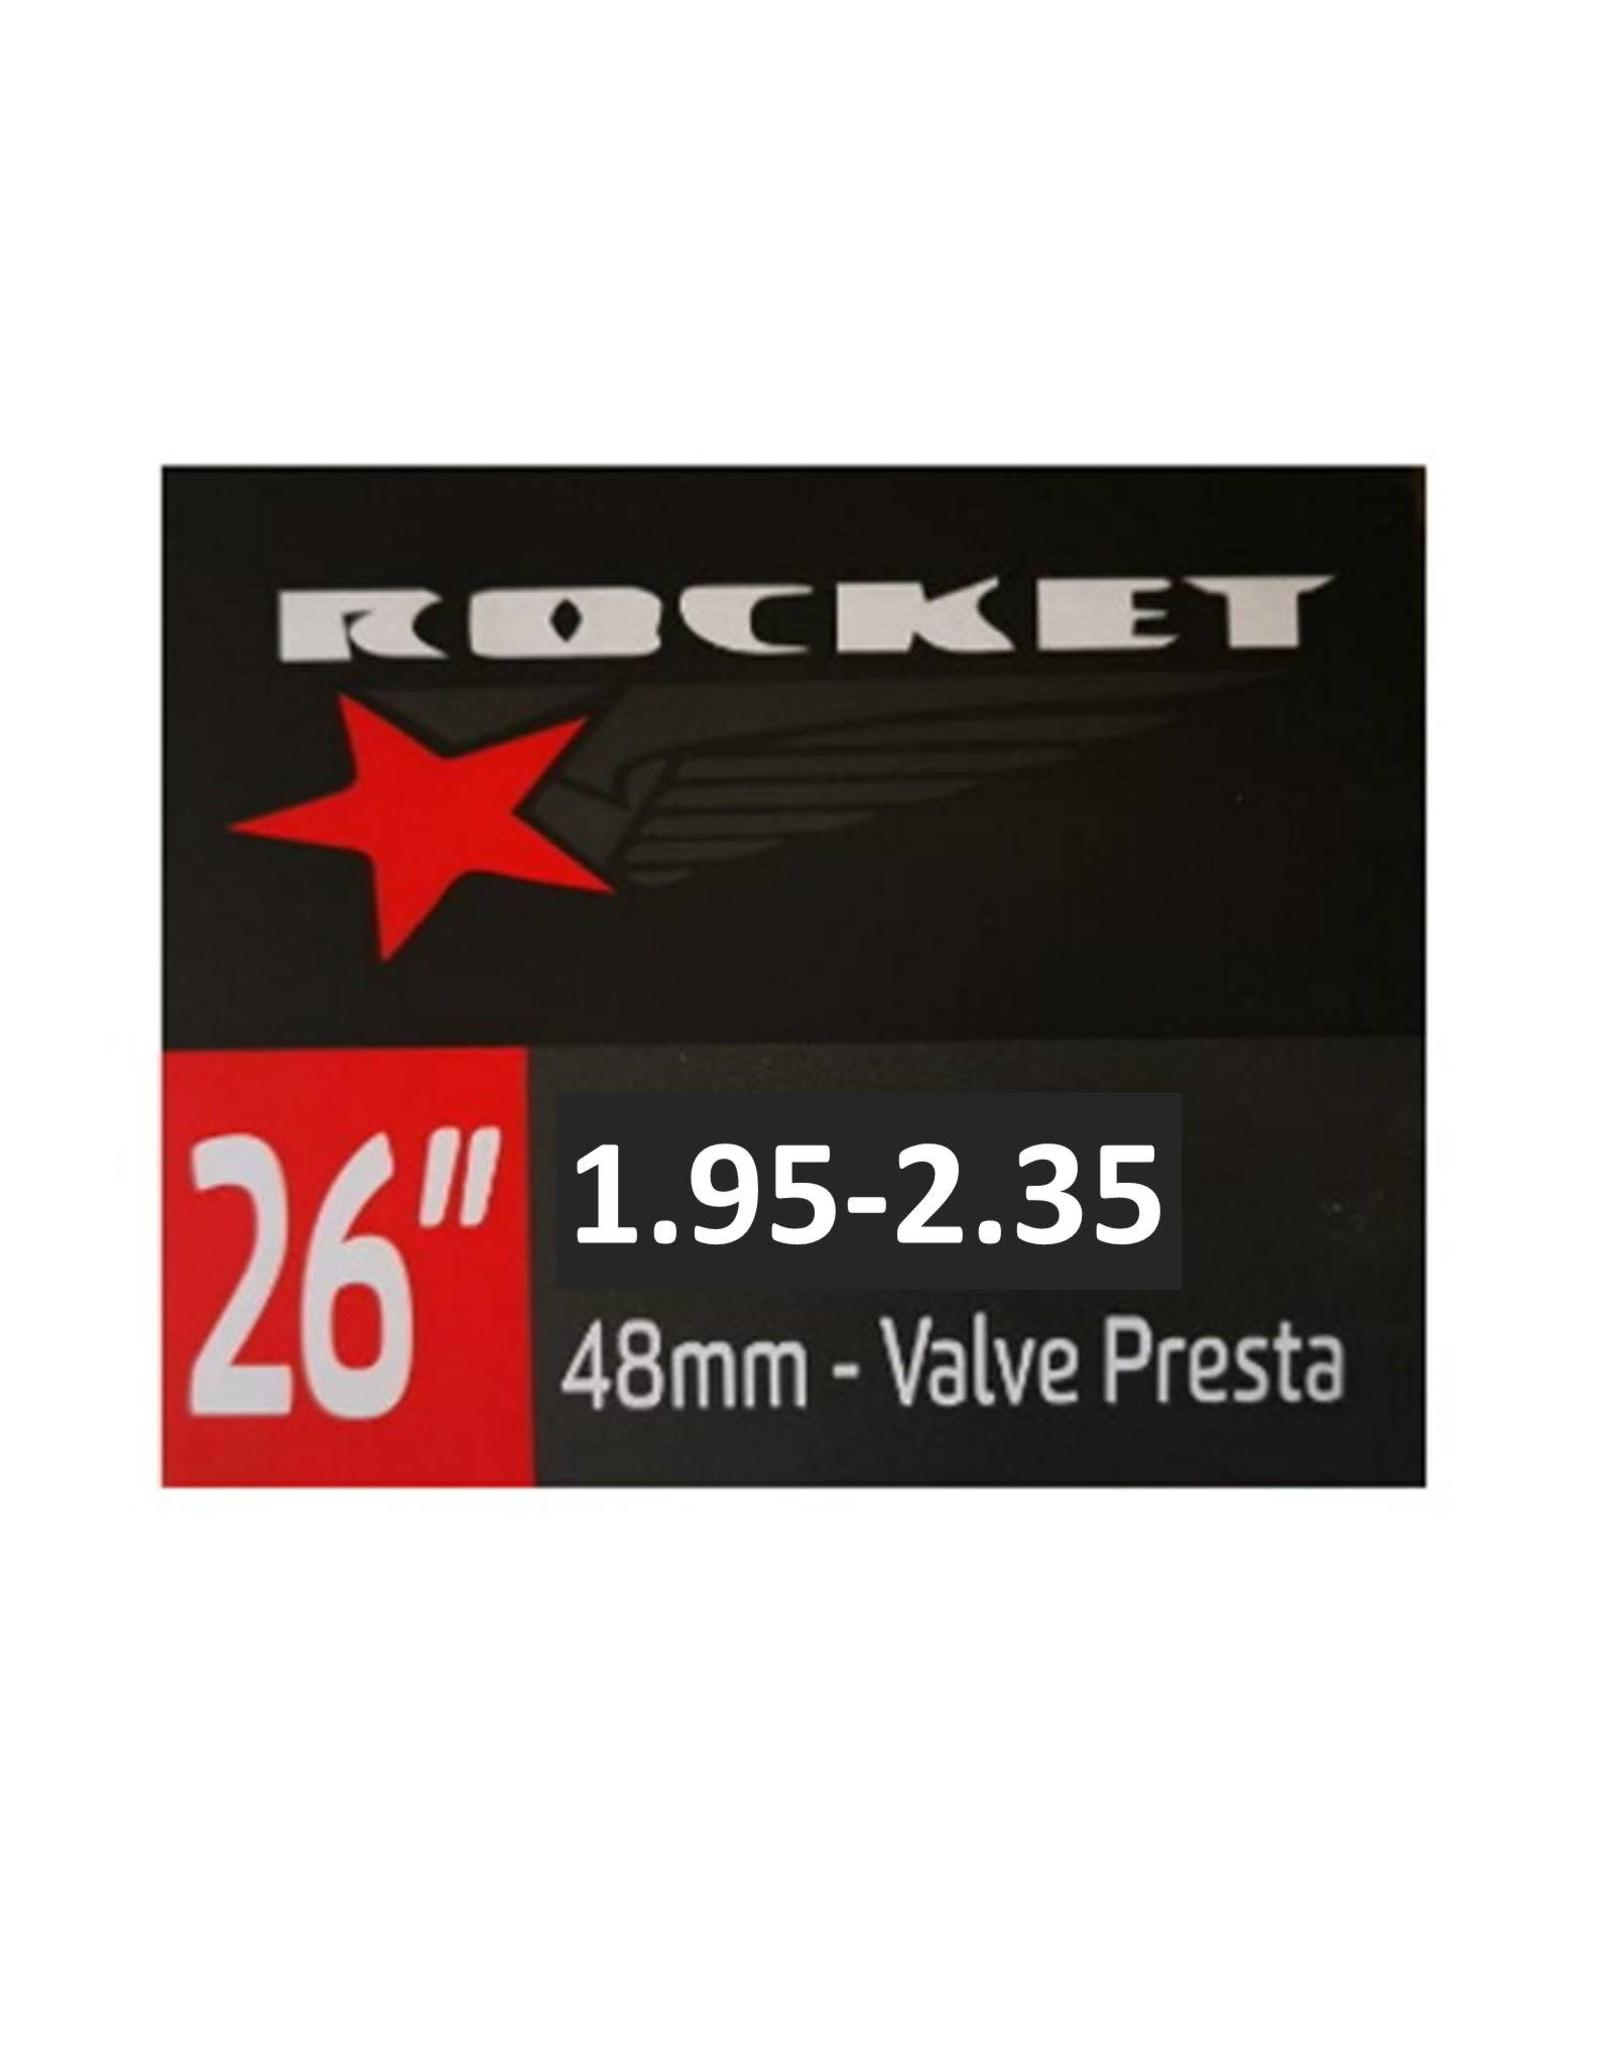 Rocket 26 X 1.95/2.35 Presta Tube